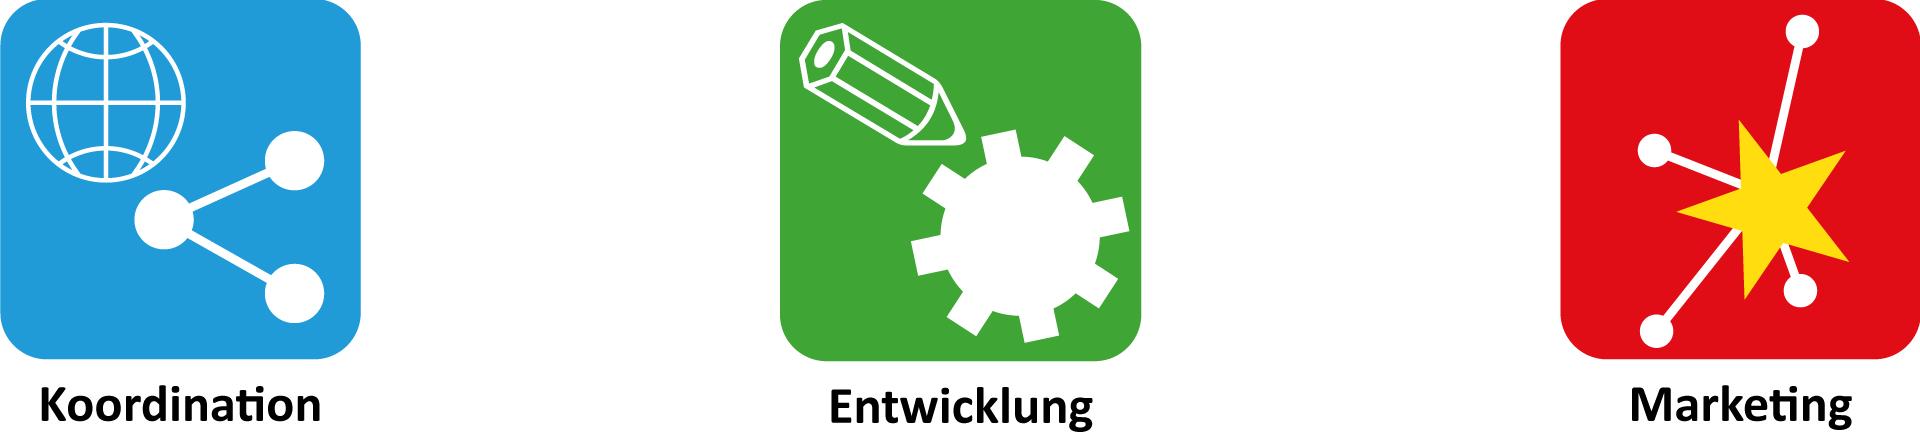 Projektmanagement - 3